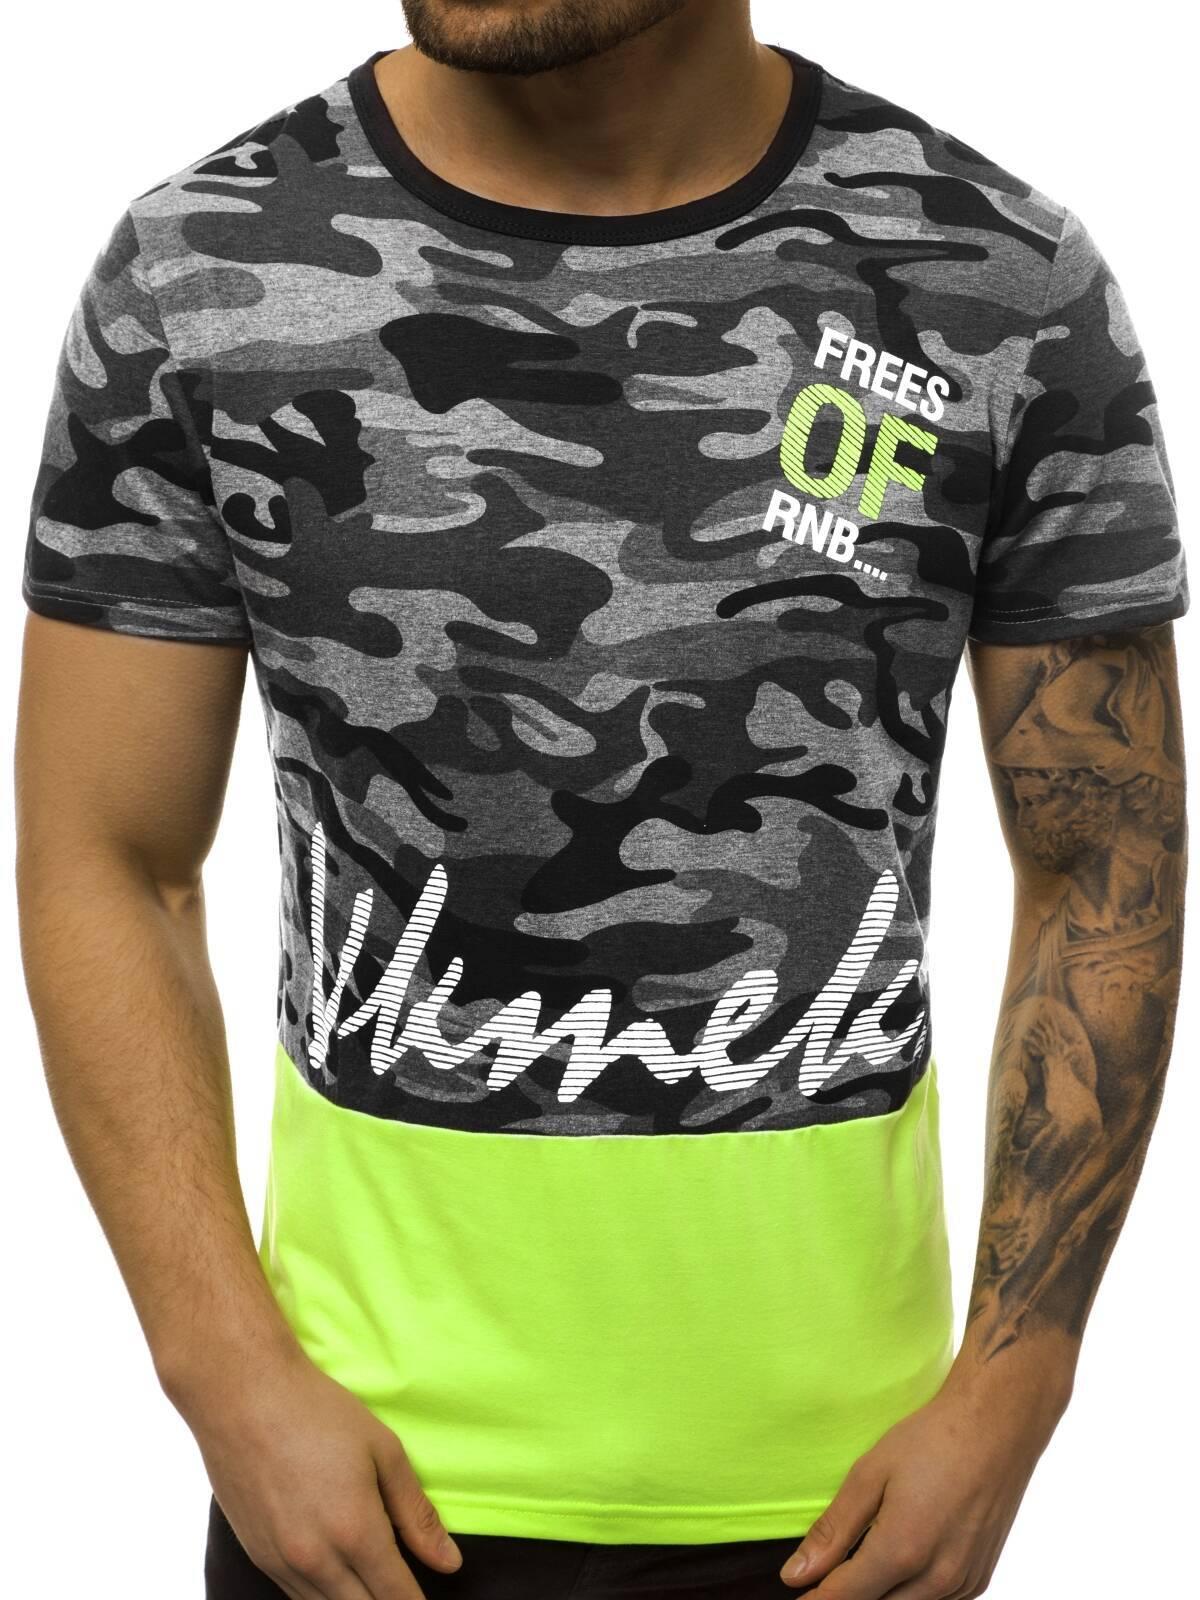 Indexbild 38 - T-Shirt Kurzarm Print Aufdruck Fitness Jogging Sport Shirt Herren OZONEE 12511